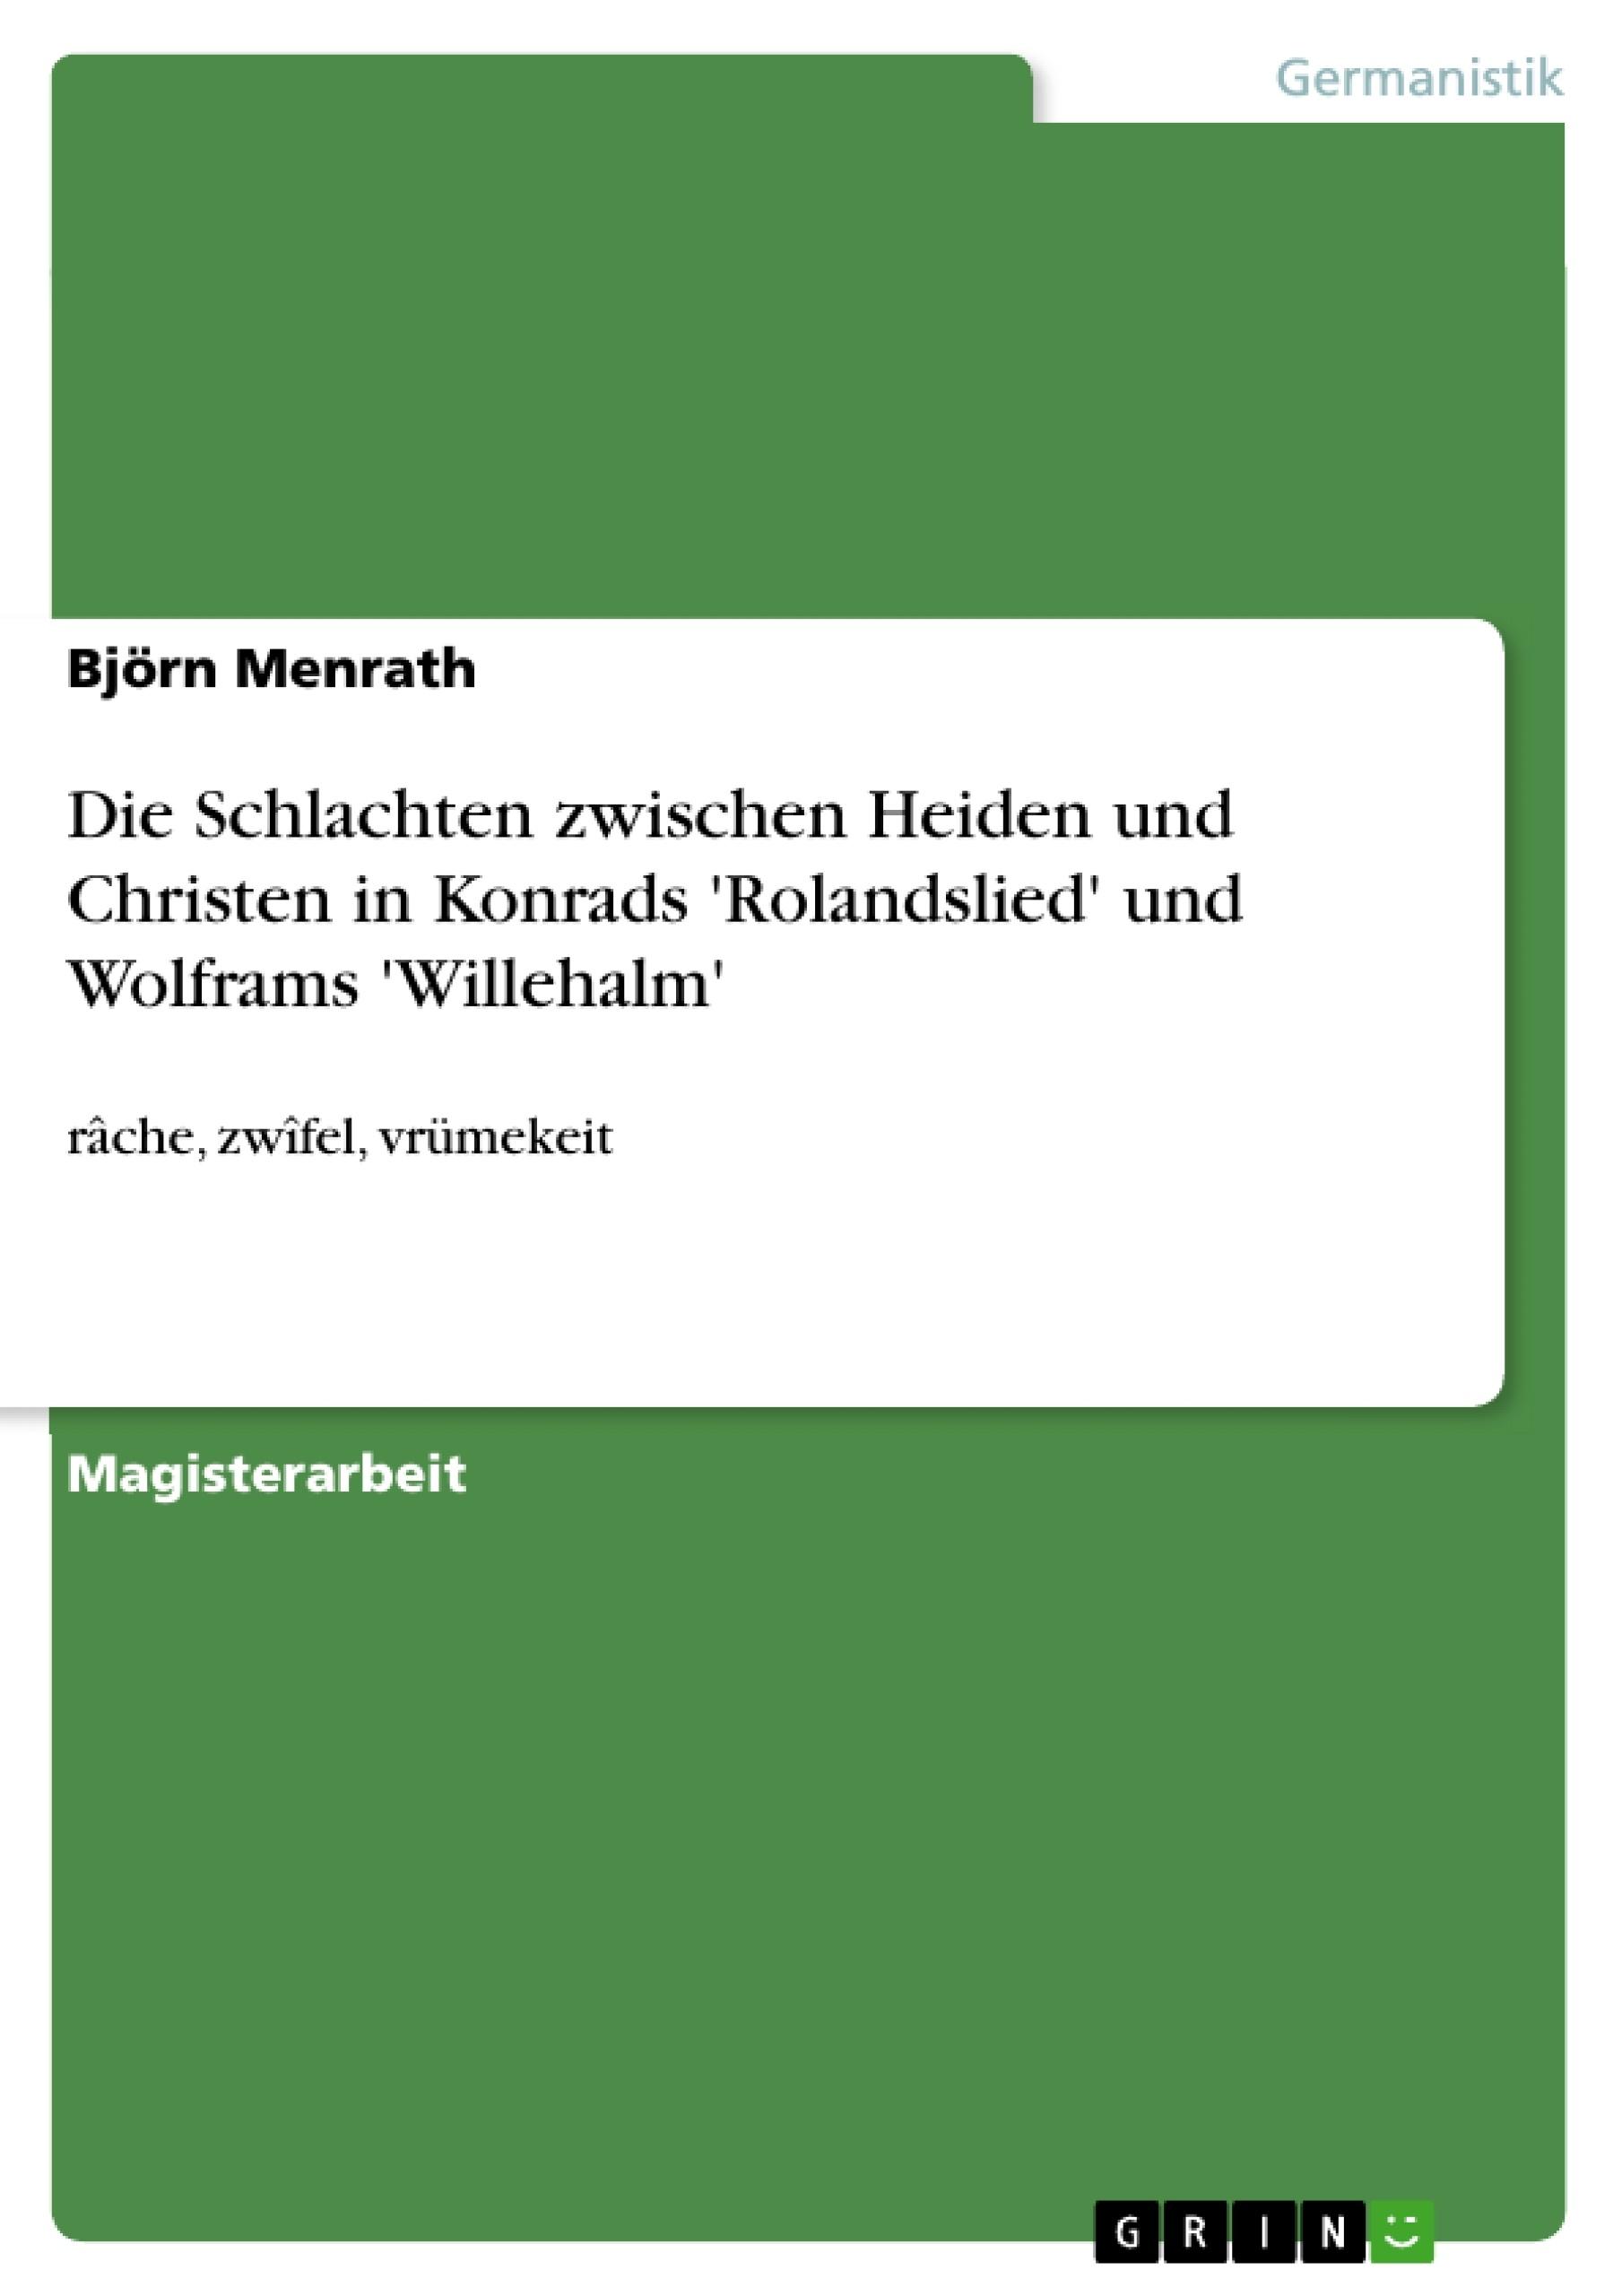 catalog germanistik aeltere deutsche literatur mediaevistik